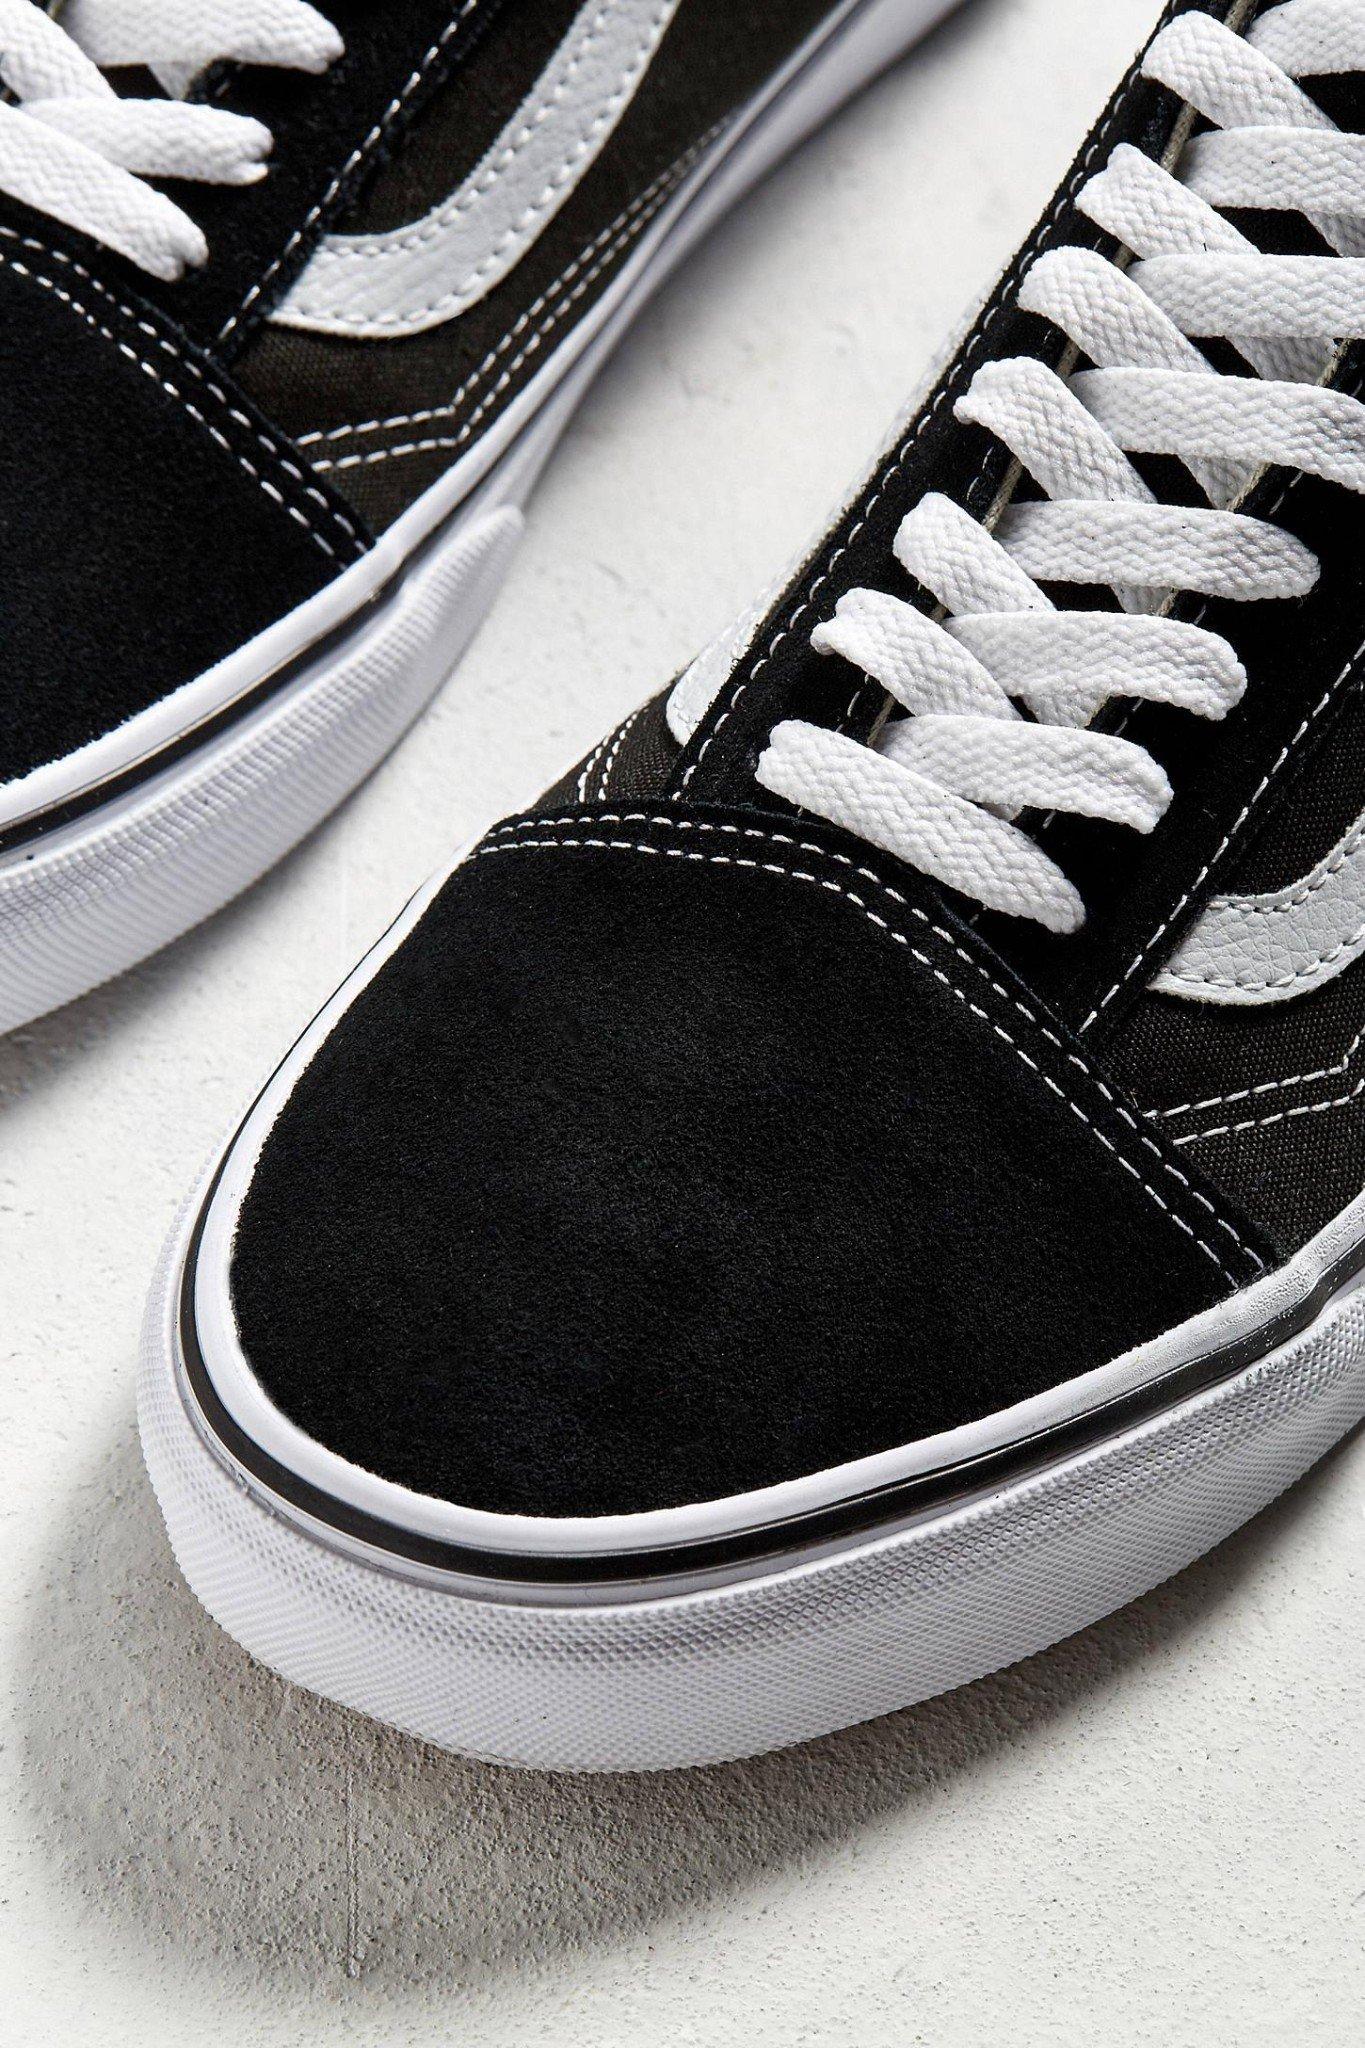 Giày Sneaker Vans Big Size Old Skool Đen Viền Trắng